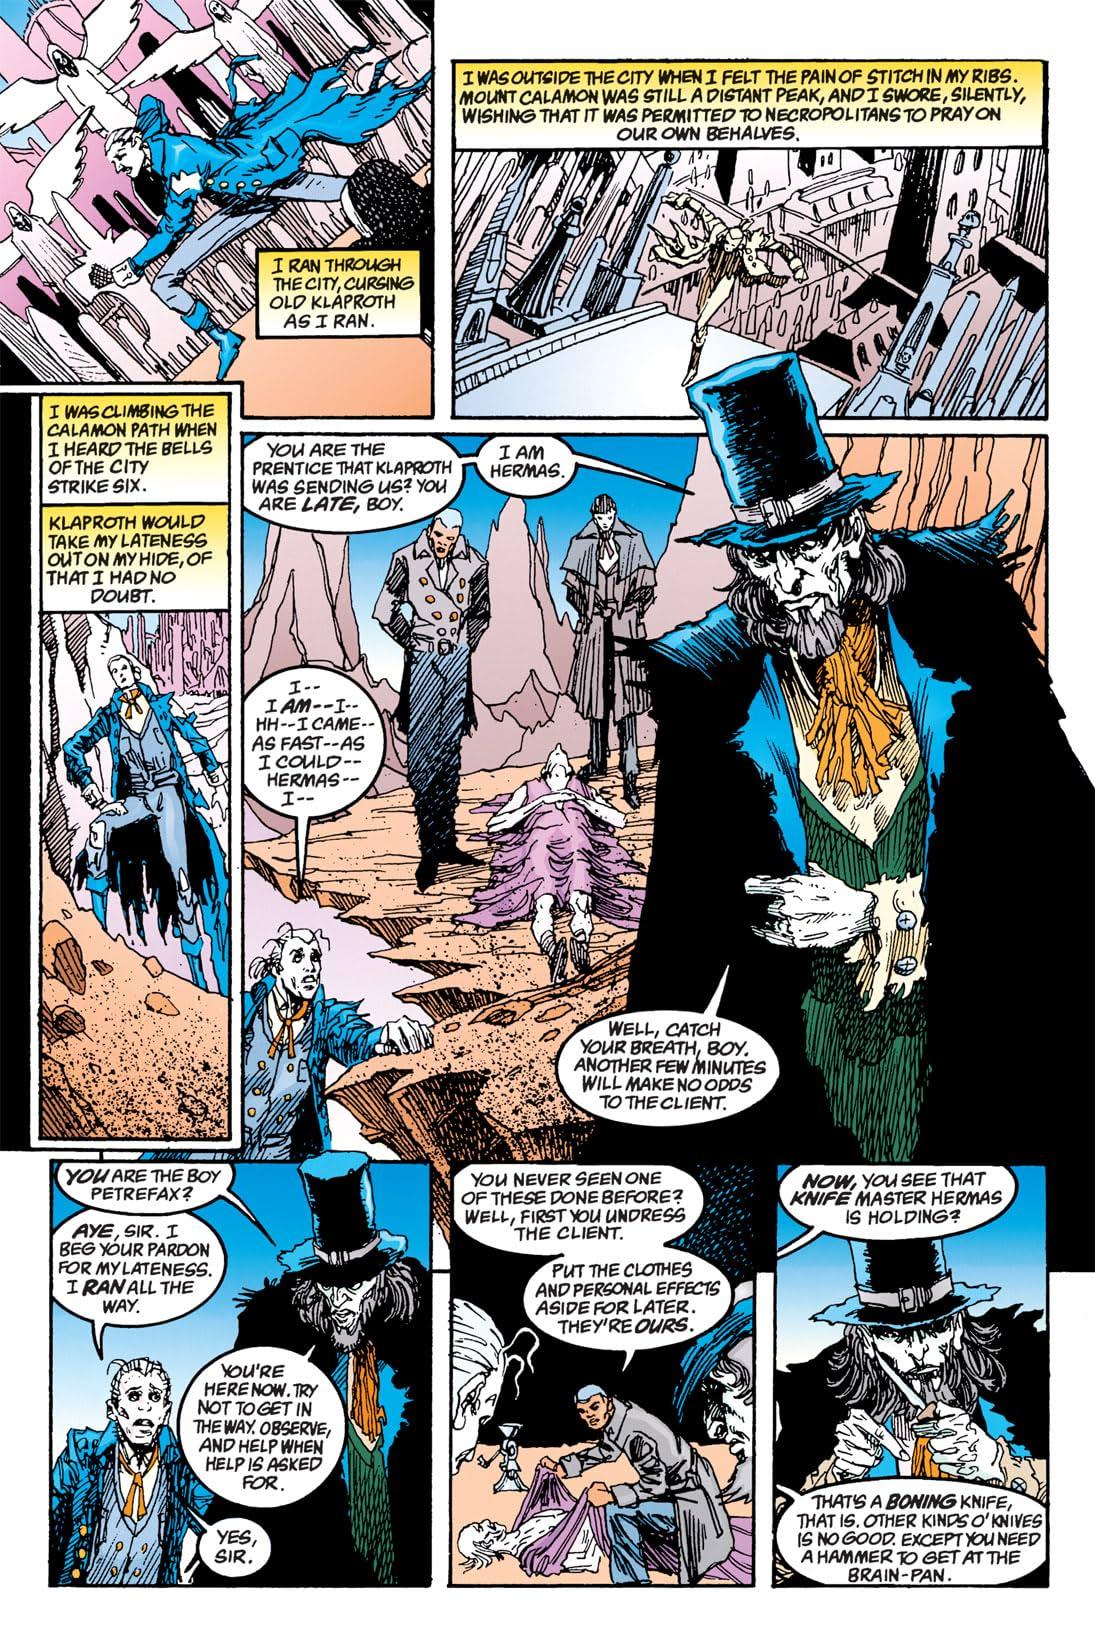 The Sandman #55